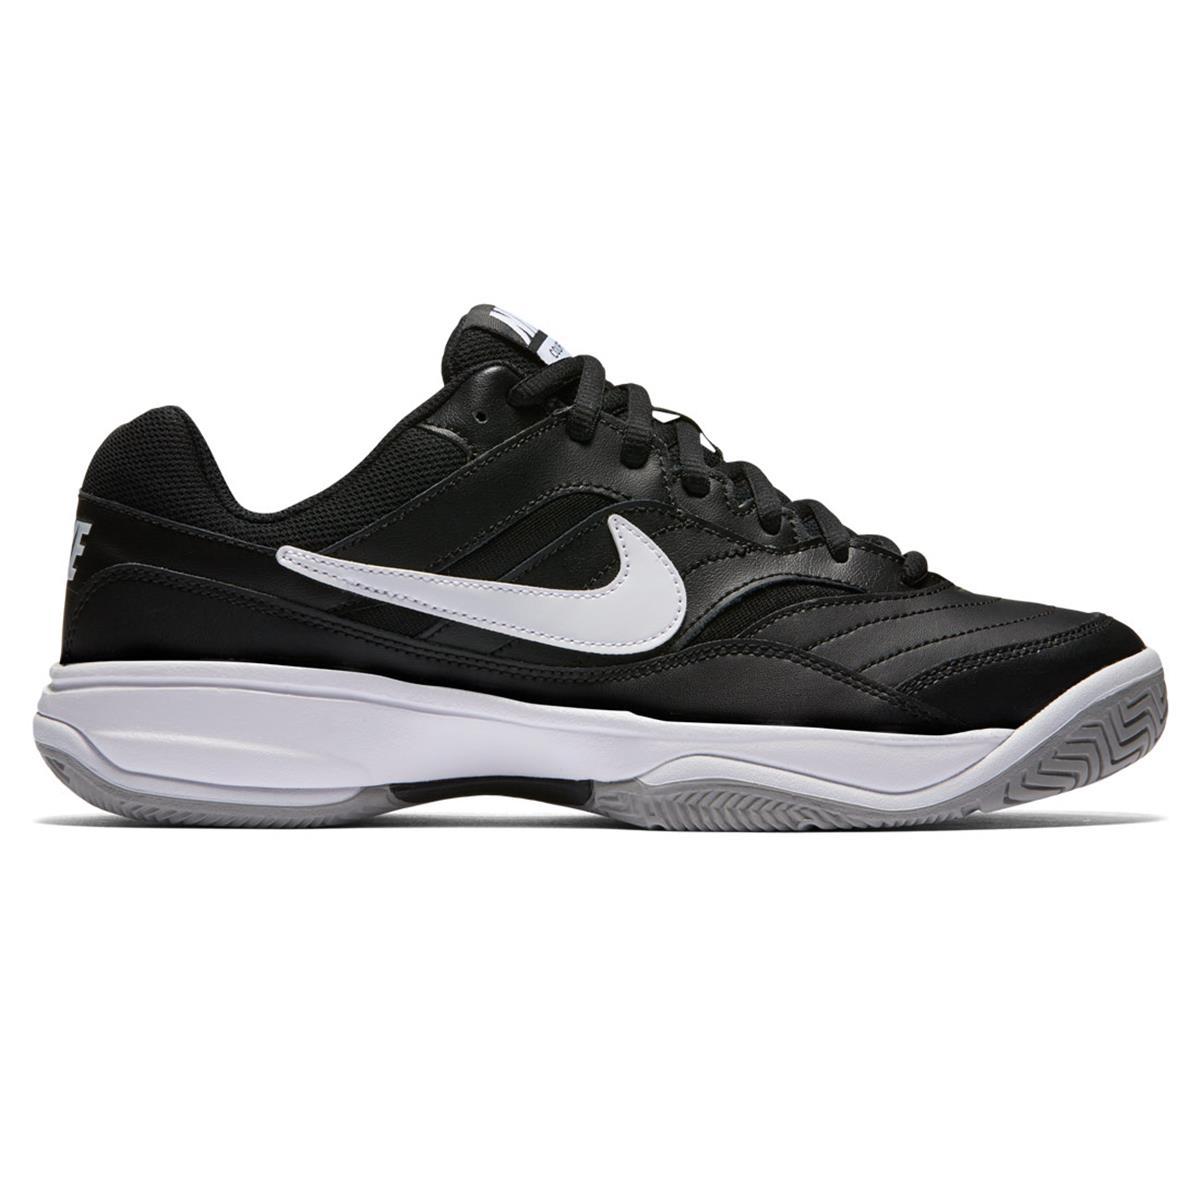 Slazanger Black Mens Tennis Shoes Review